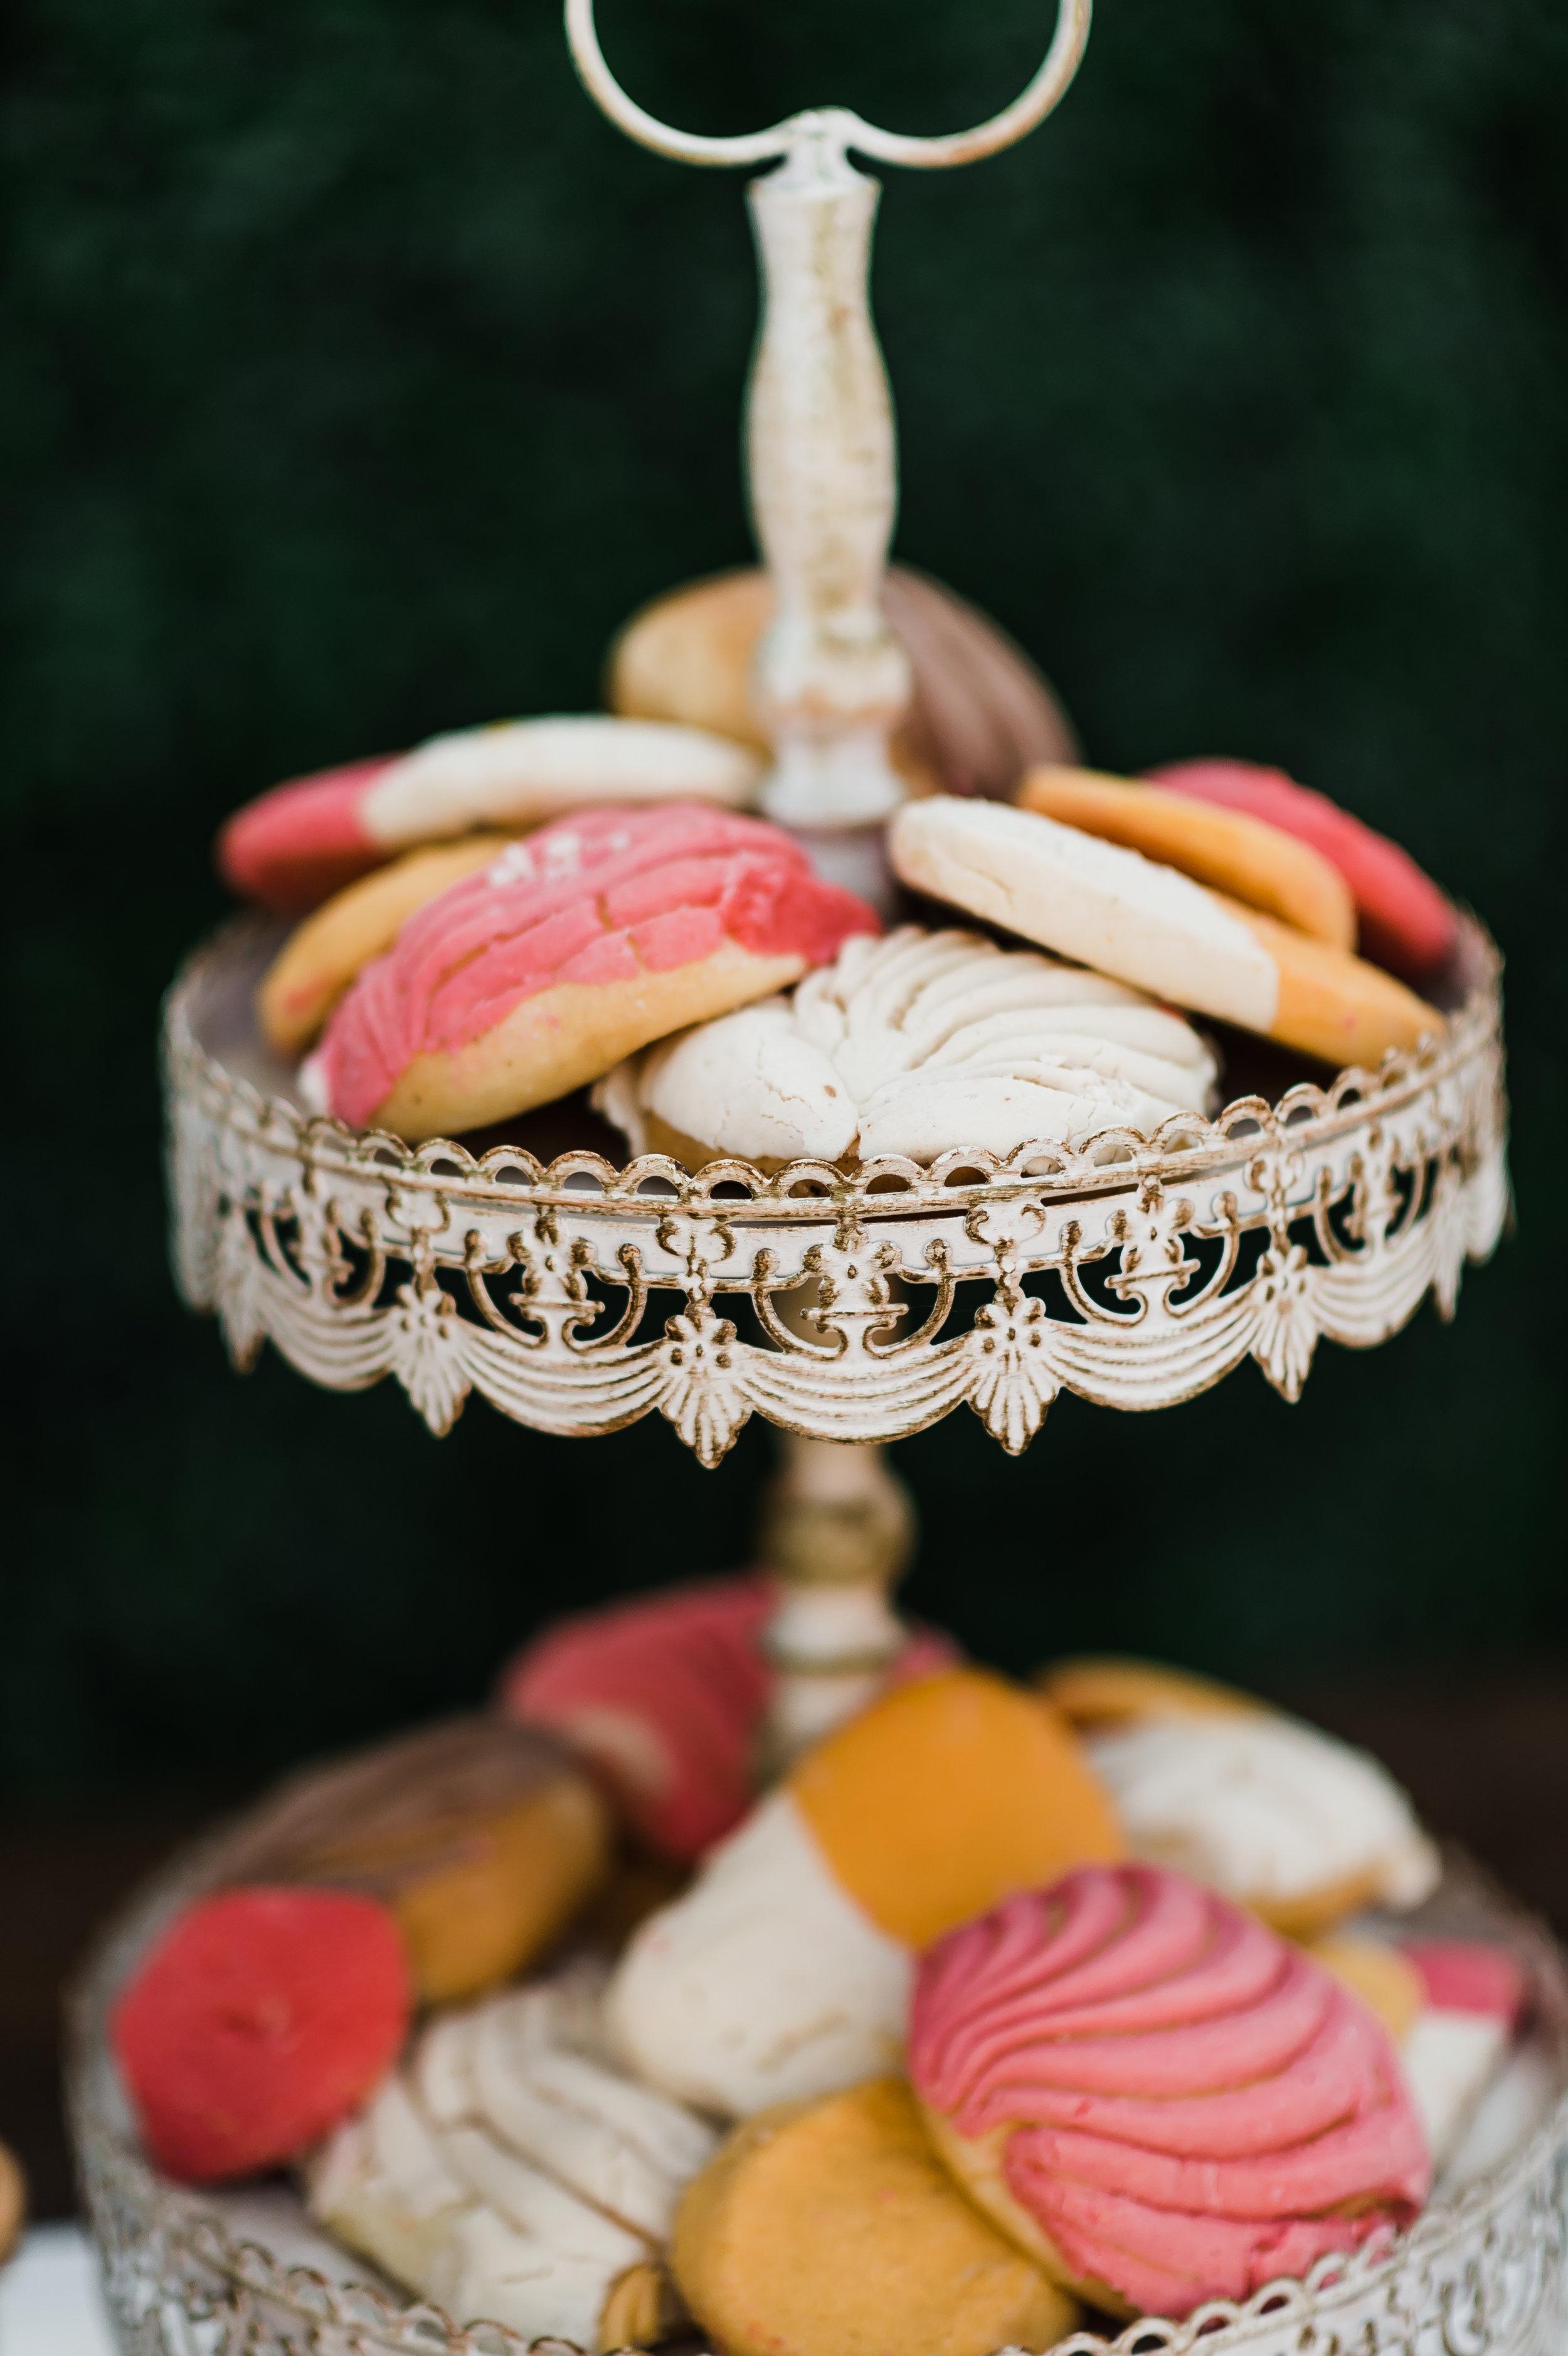 www.santabarbarawedding.com | Michelle Ramirez Photography | Olivas Adobe | Karen Marie Events | Tangled Lotus | Sweet D's Cakes | Wedding Cake and Desserts